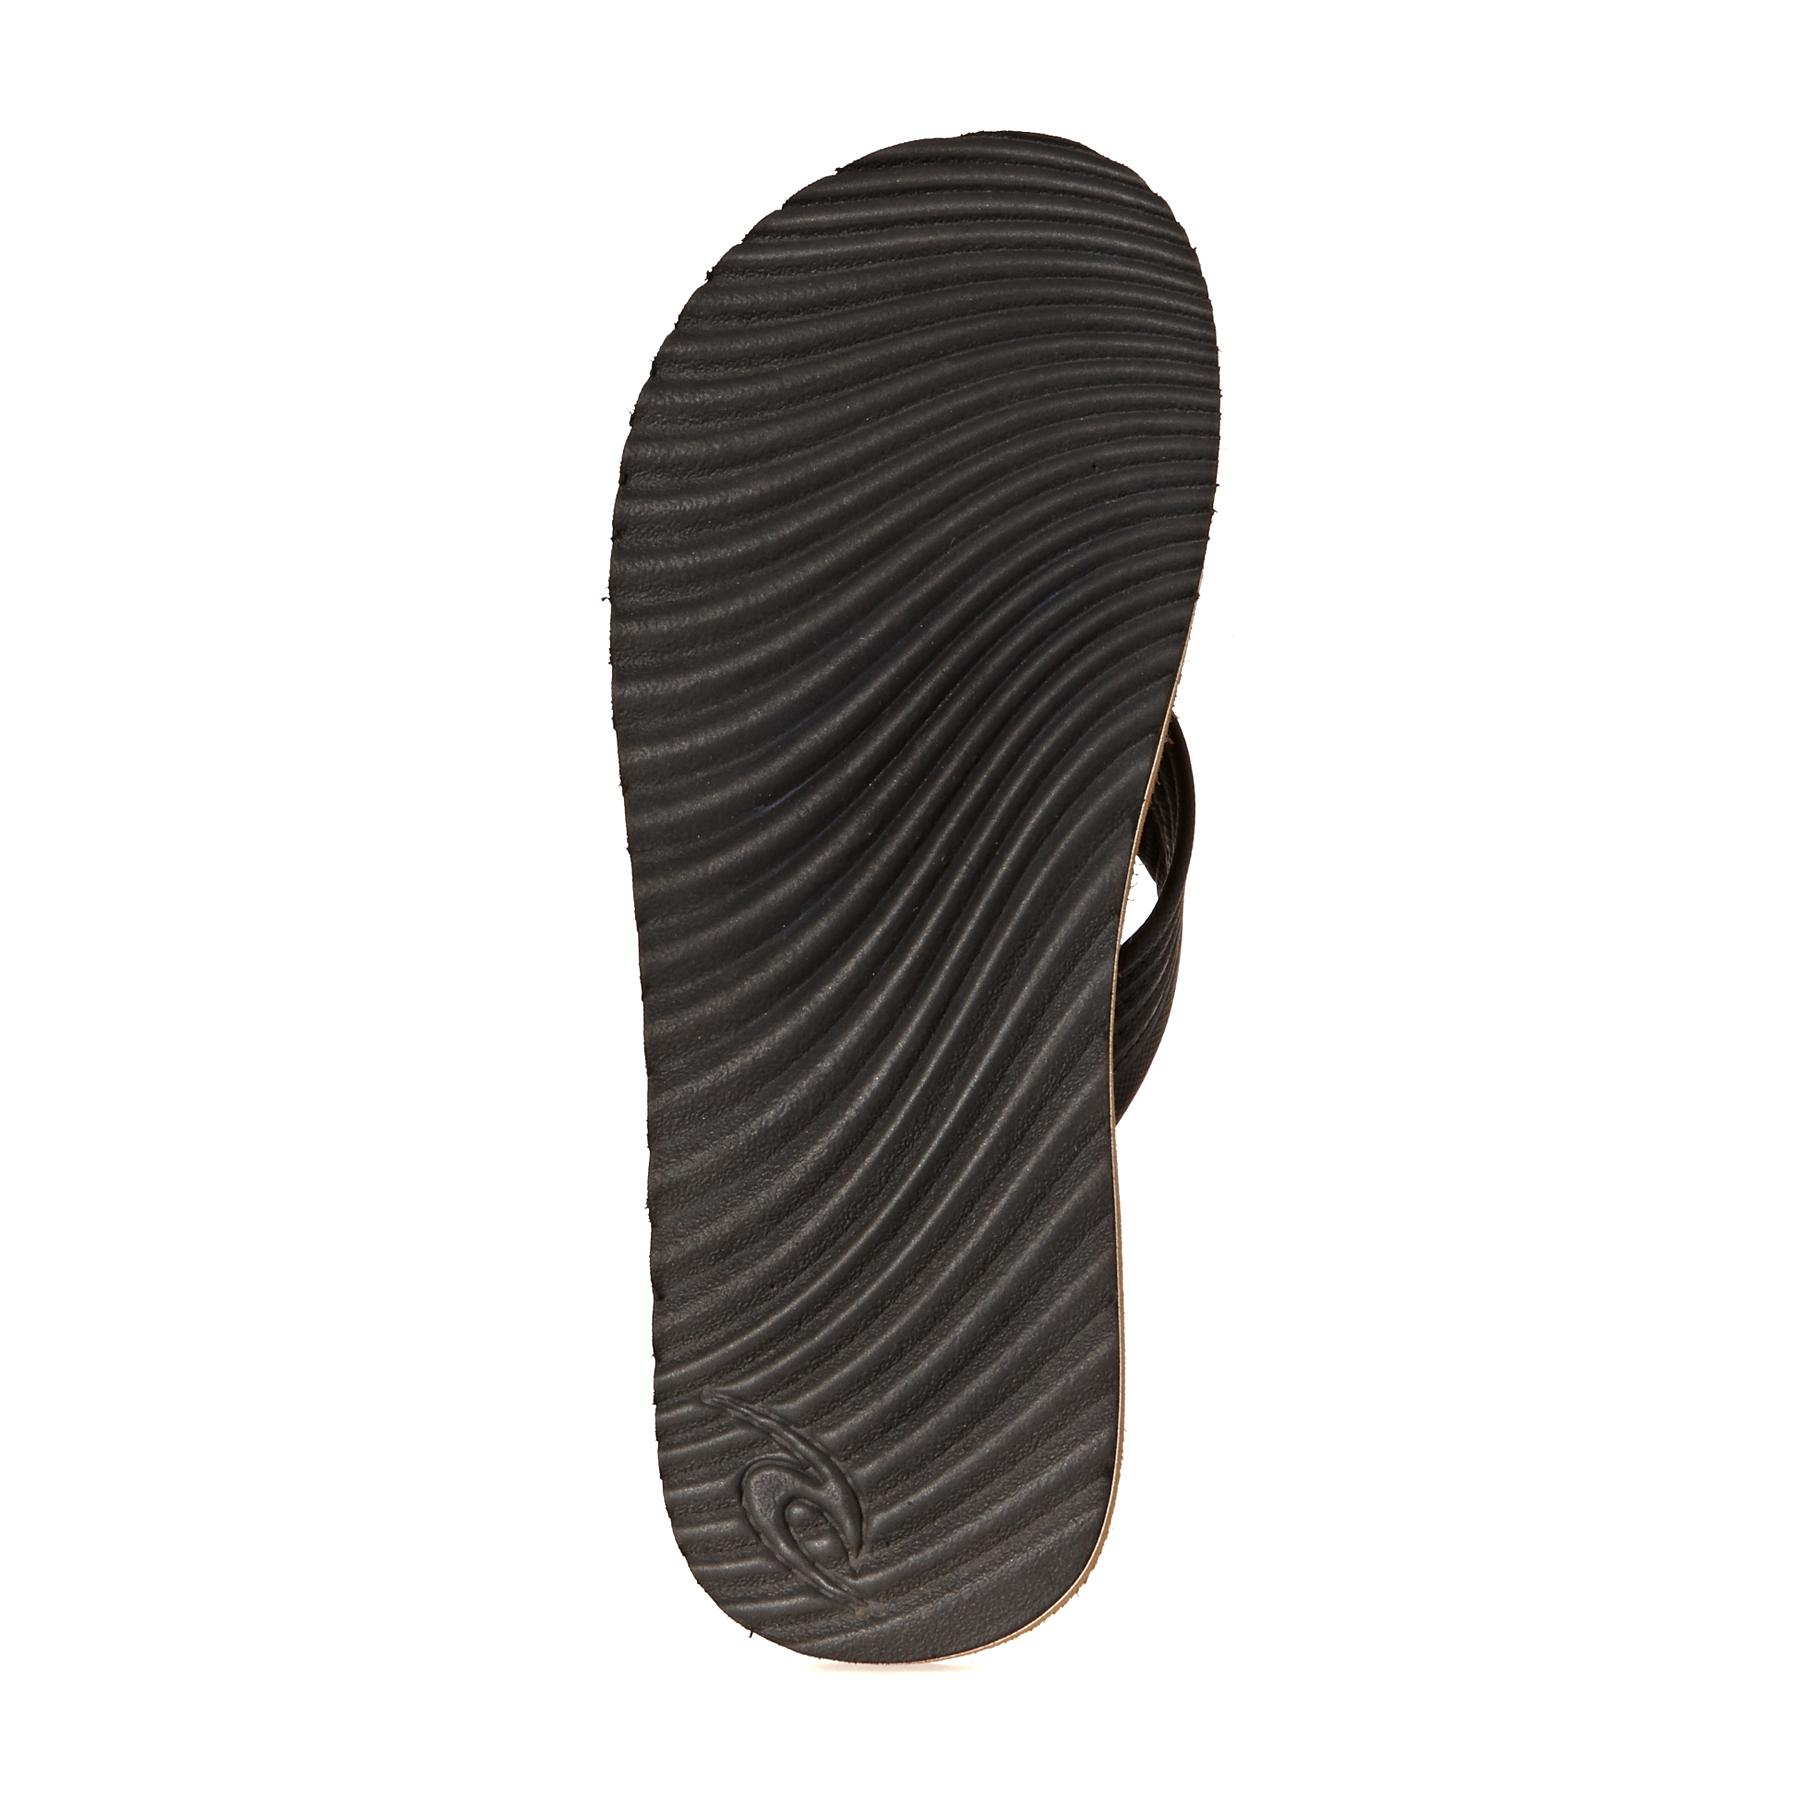 Rip Curl Dbah Sandals